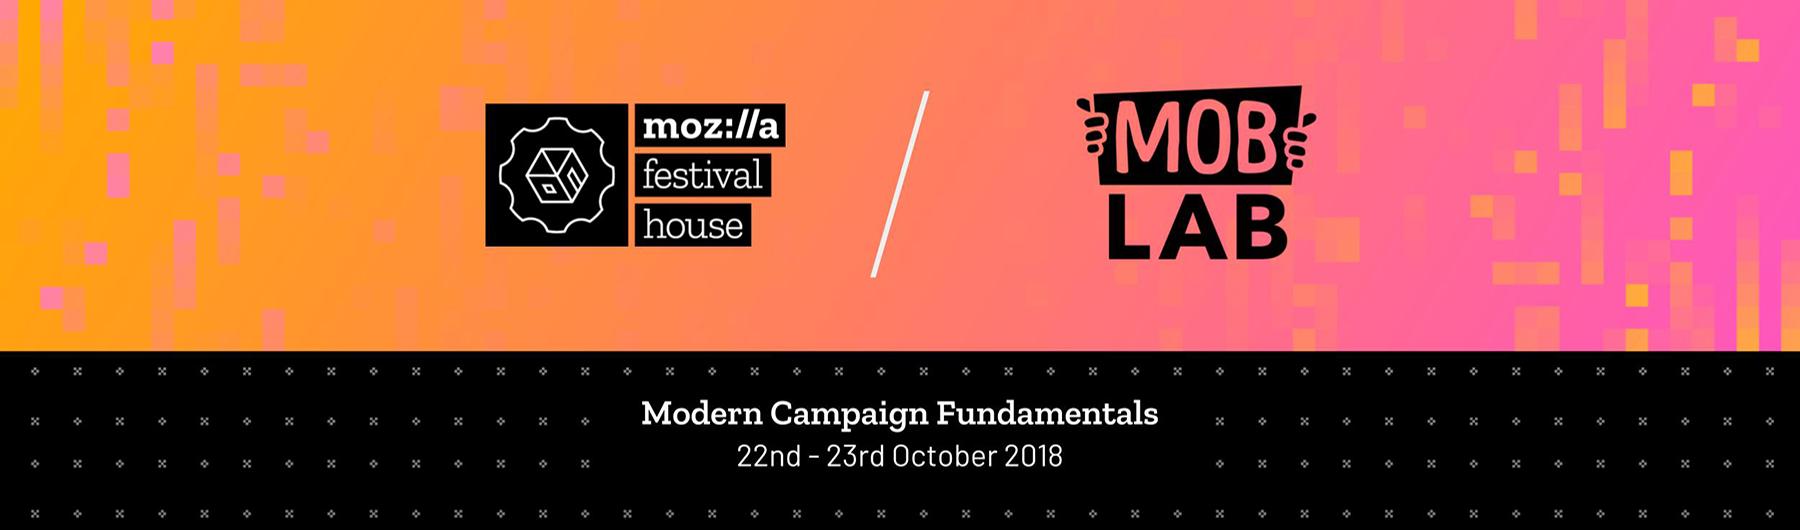 Modern Campaign Fundamentals